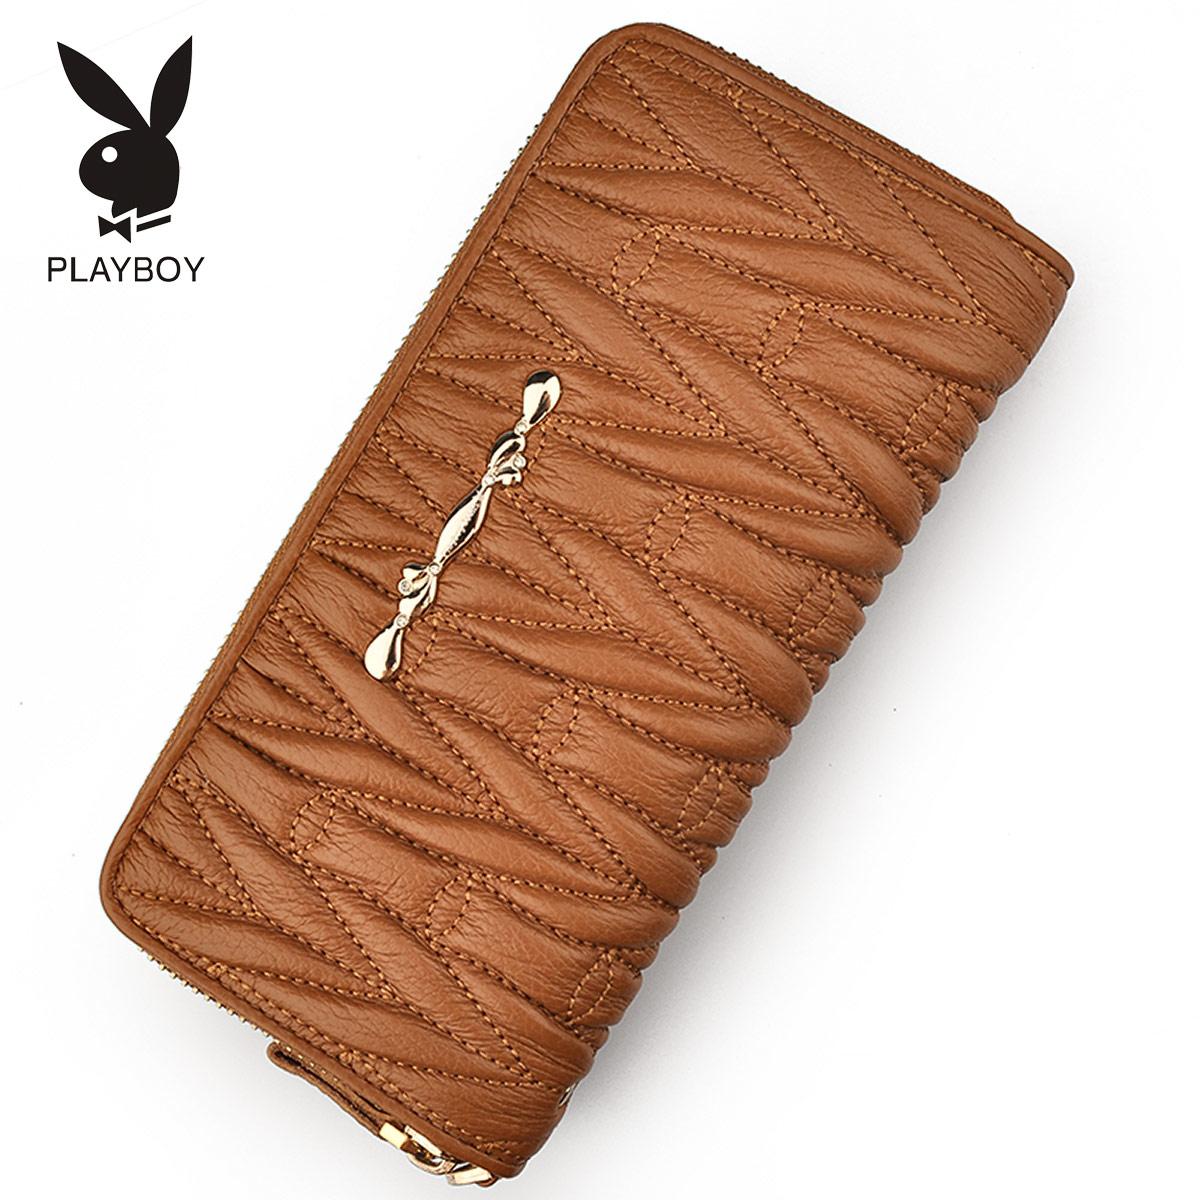 Сумка Playboy pcb0001/12 2013